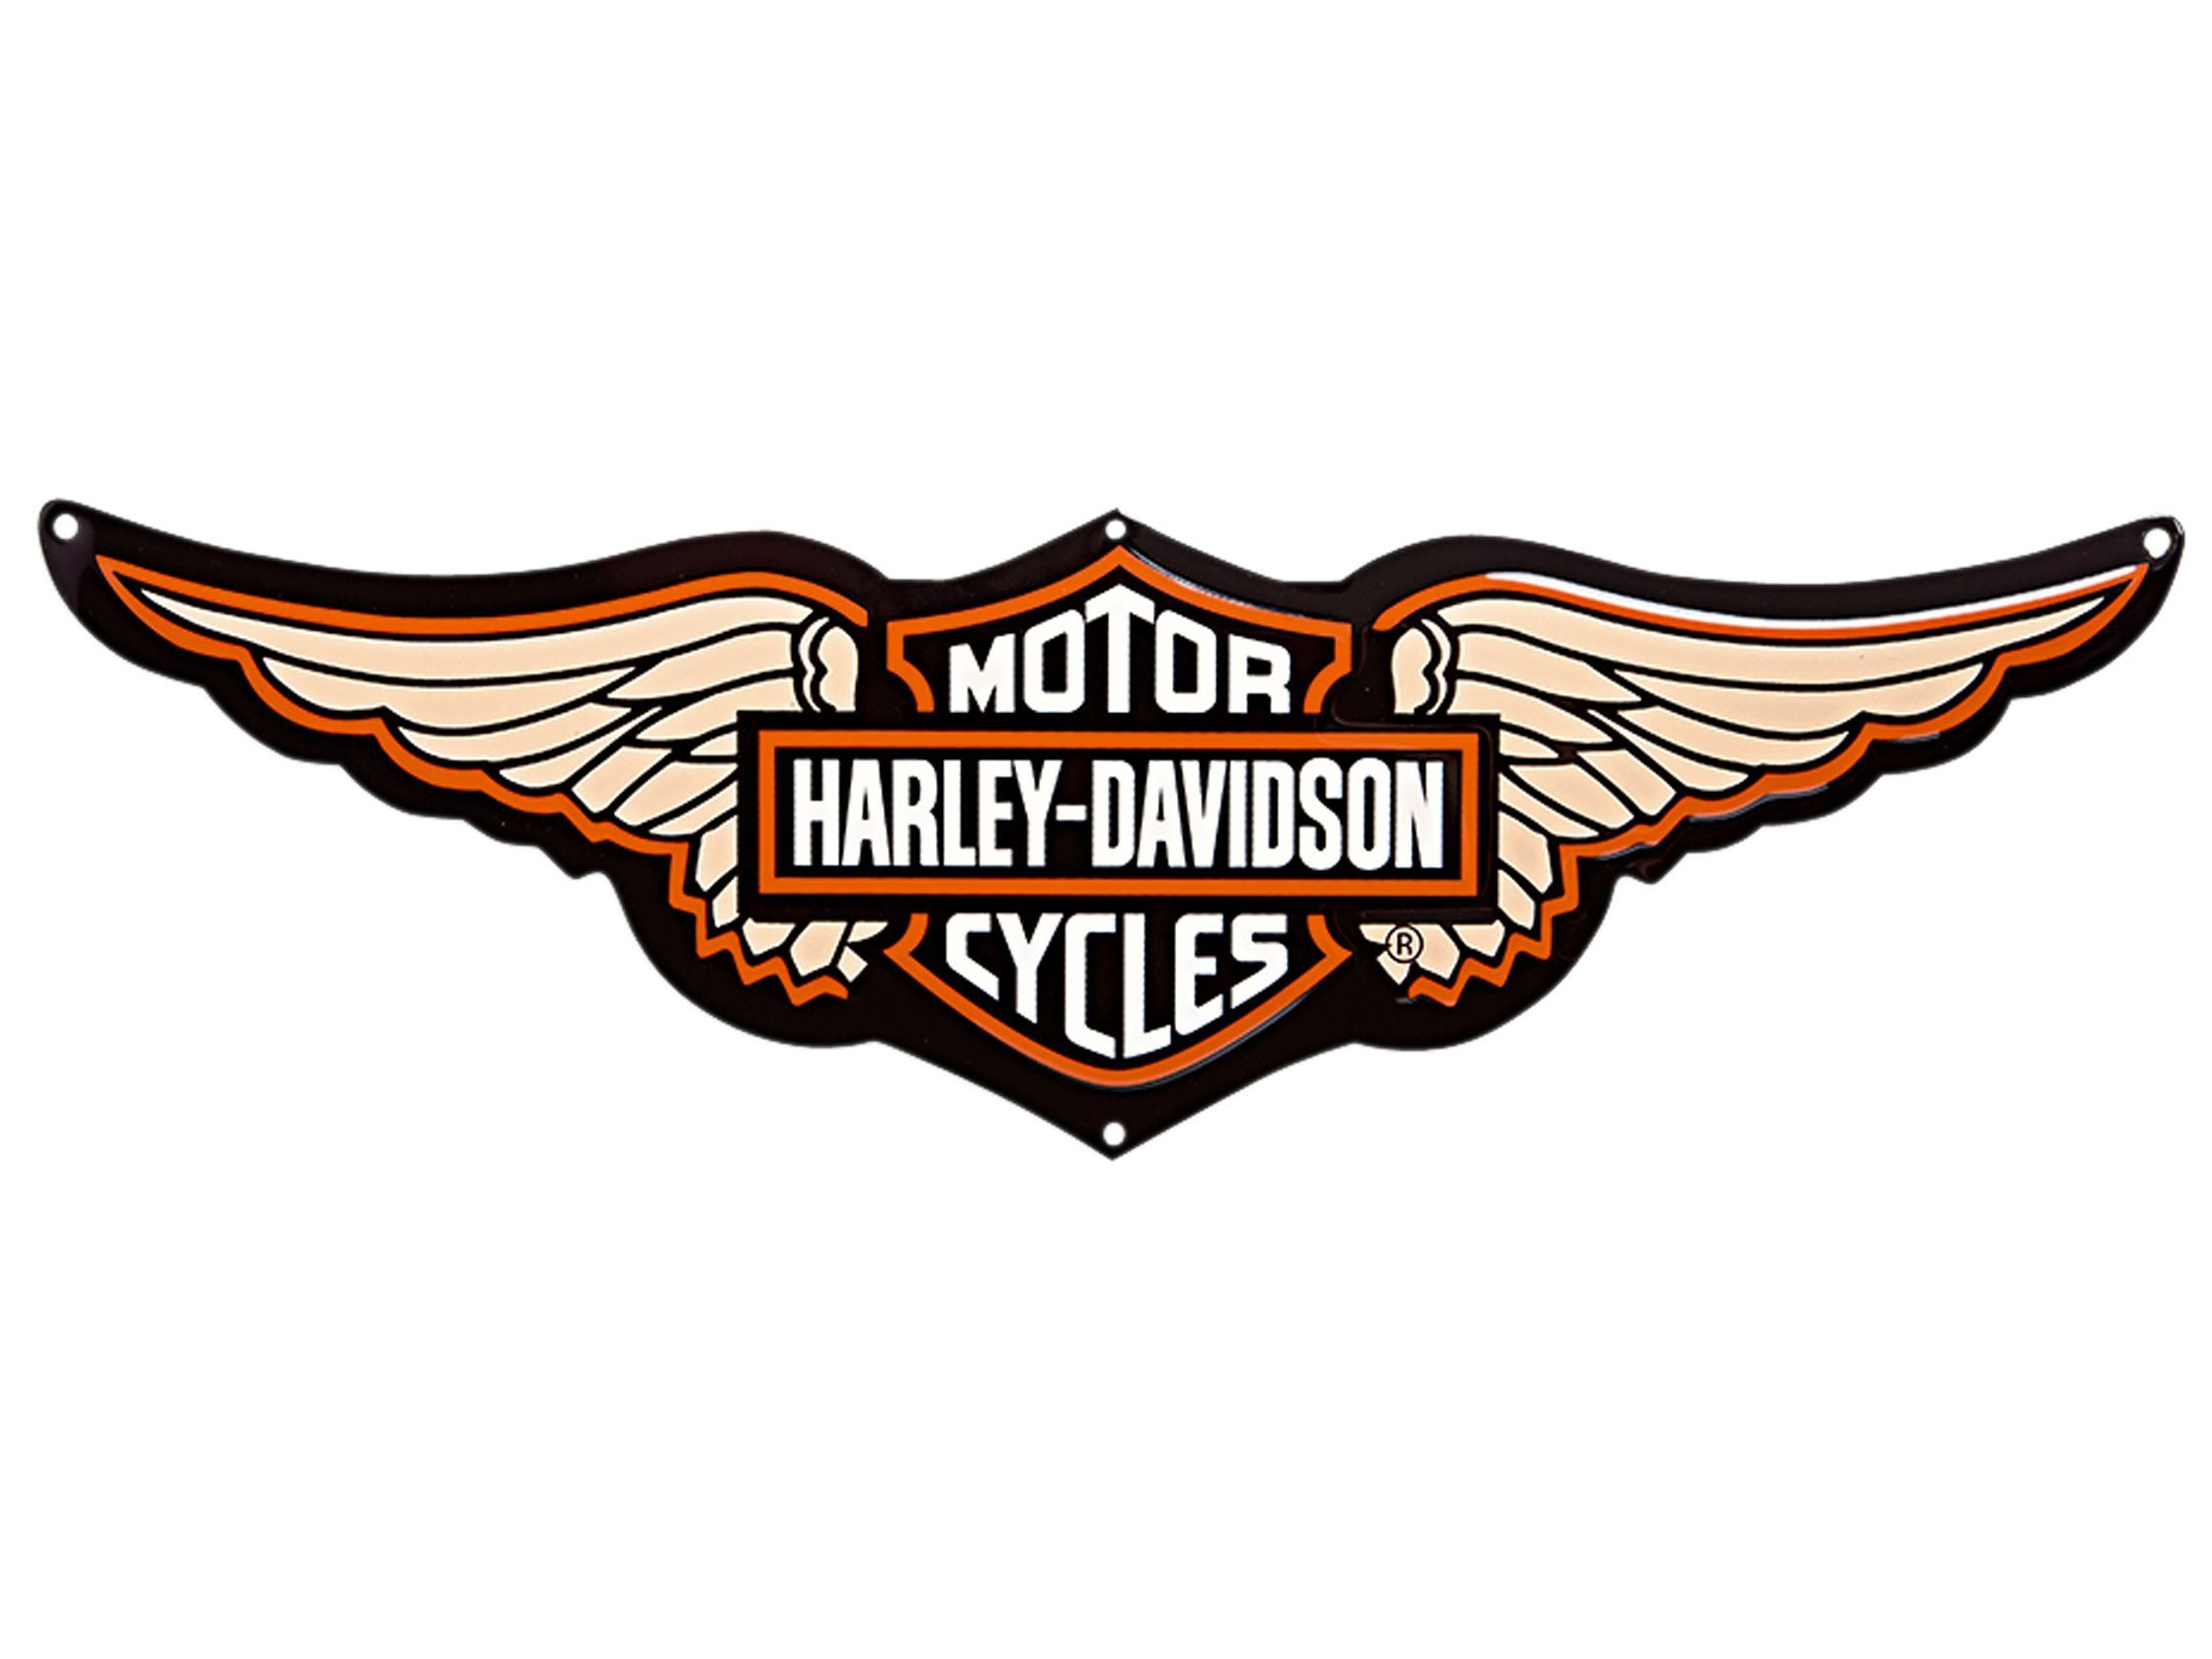 6 Buoyant Cool Tricks Harley Davidson Fatboy Logo Harley Davidson Vintage Harley Da Harley Davidson Logo Harley Davidson Wallpaper Harley Davidson Motorcycles [ 1680 x 2240 Pixel ]